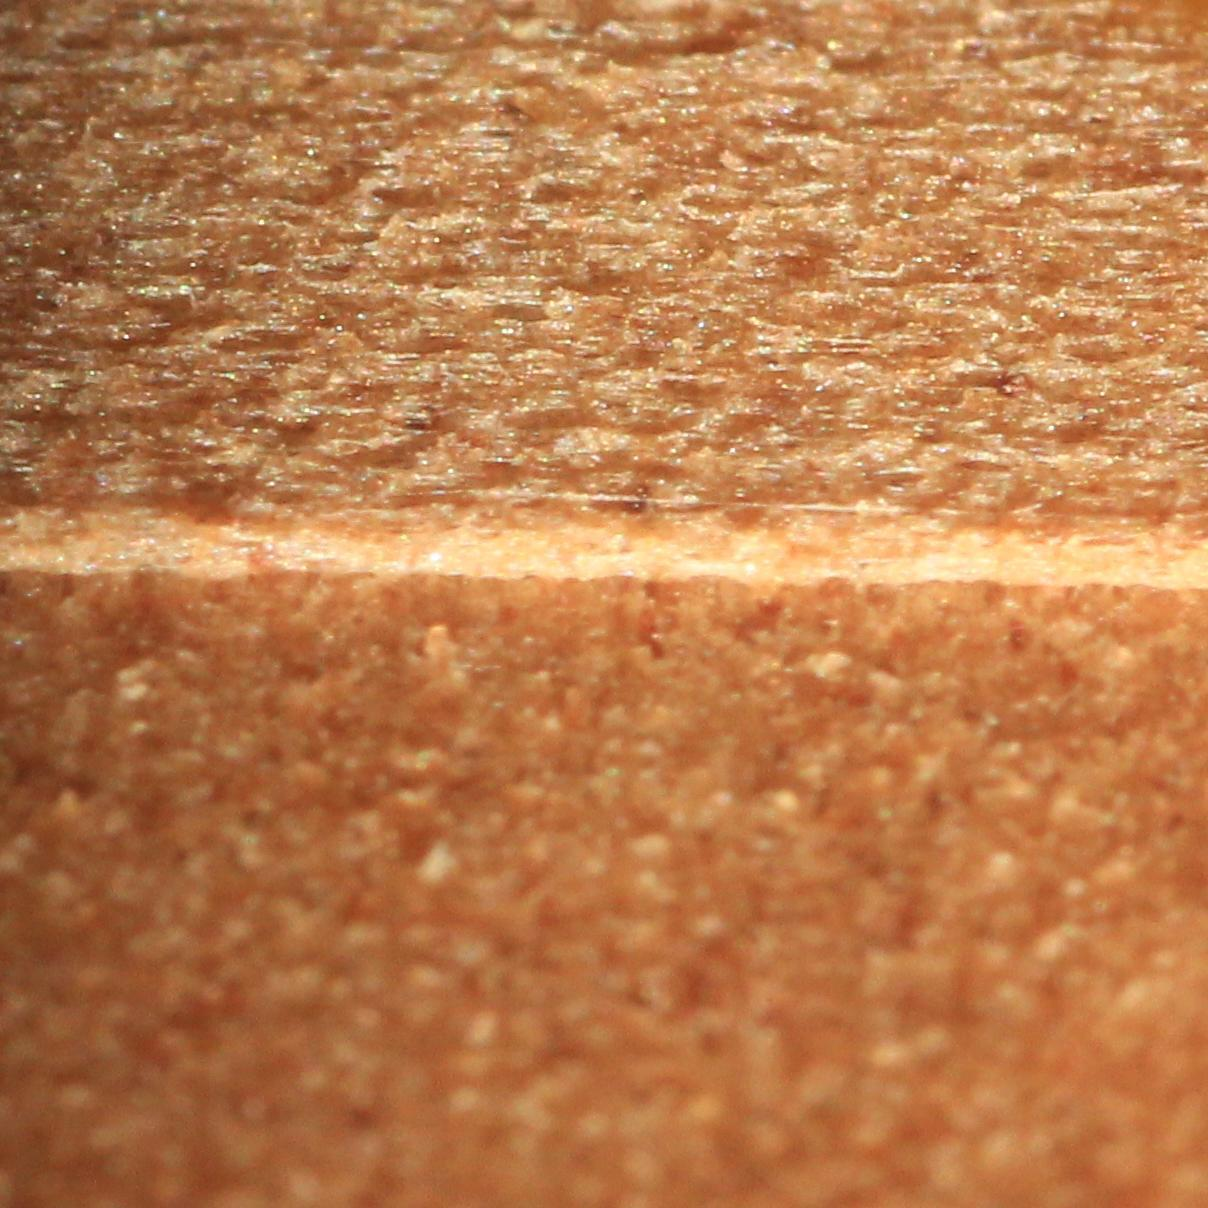 Laywood detail02 - tridimake.com